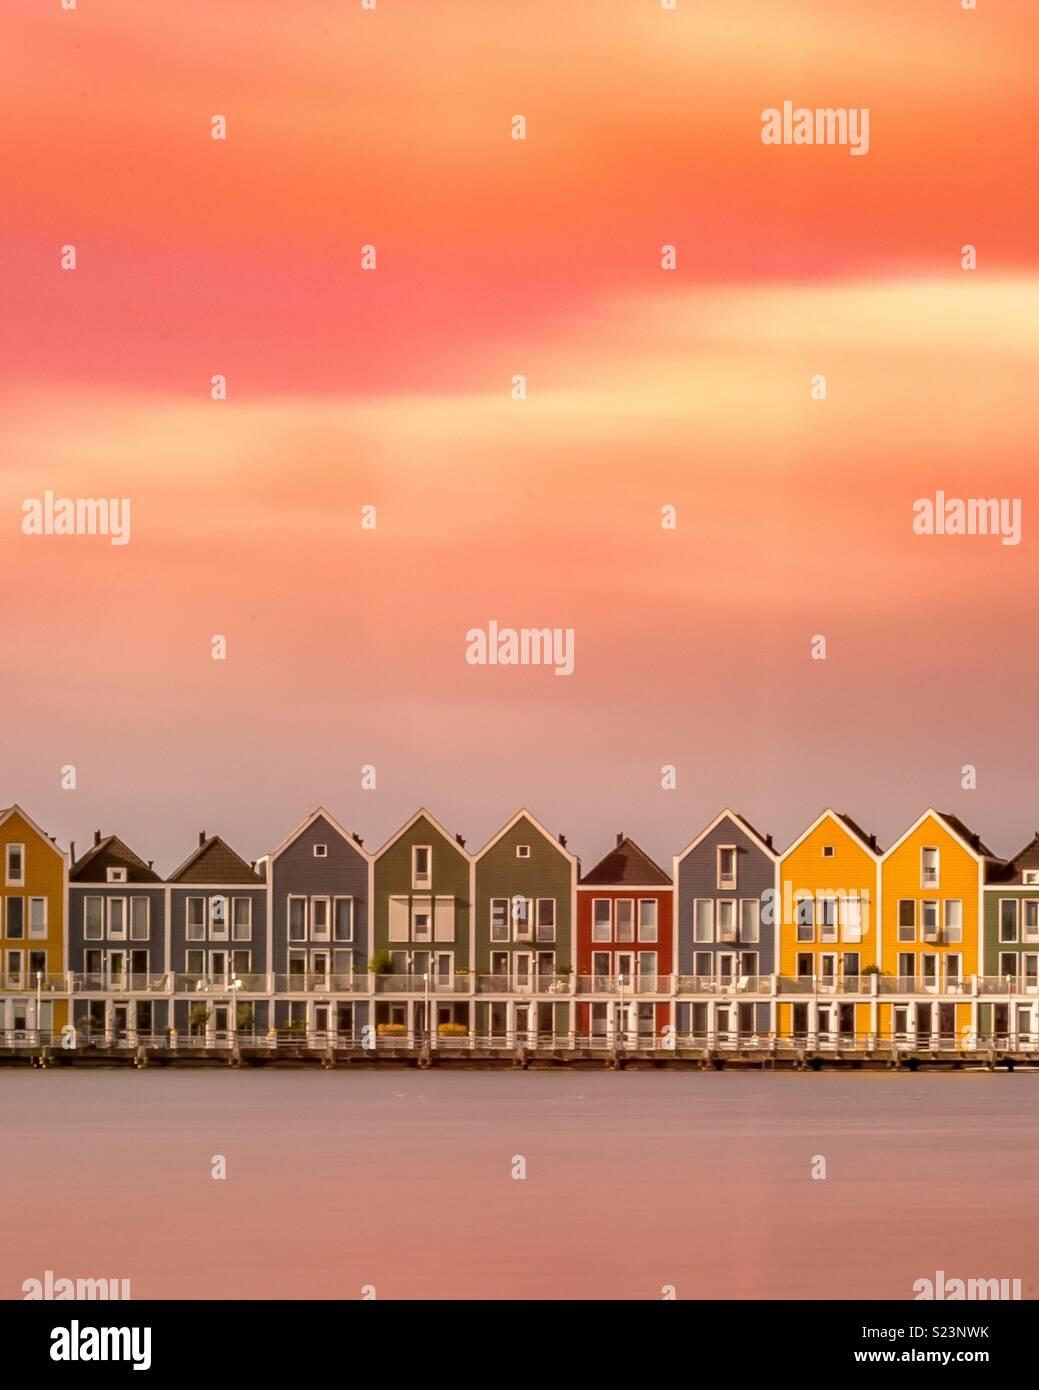 Case colorate, Paesi Bassi Immagini Stock